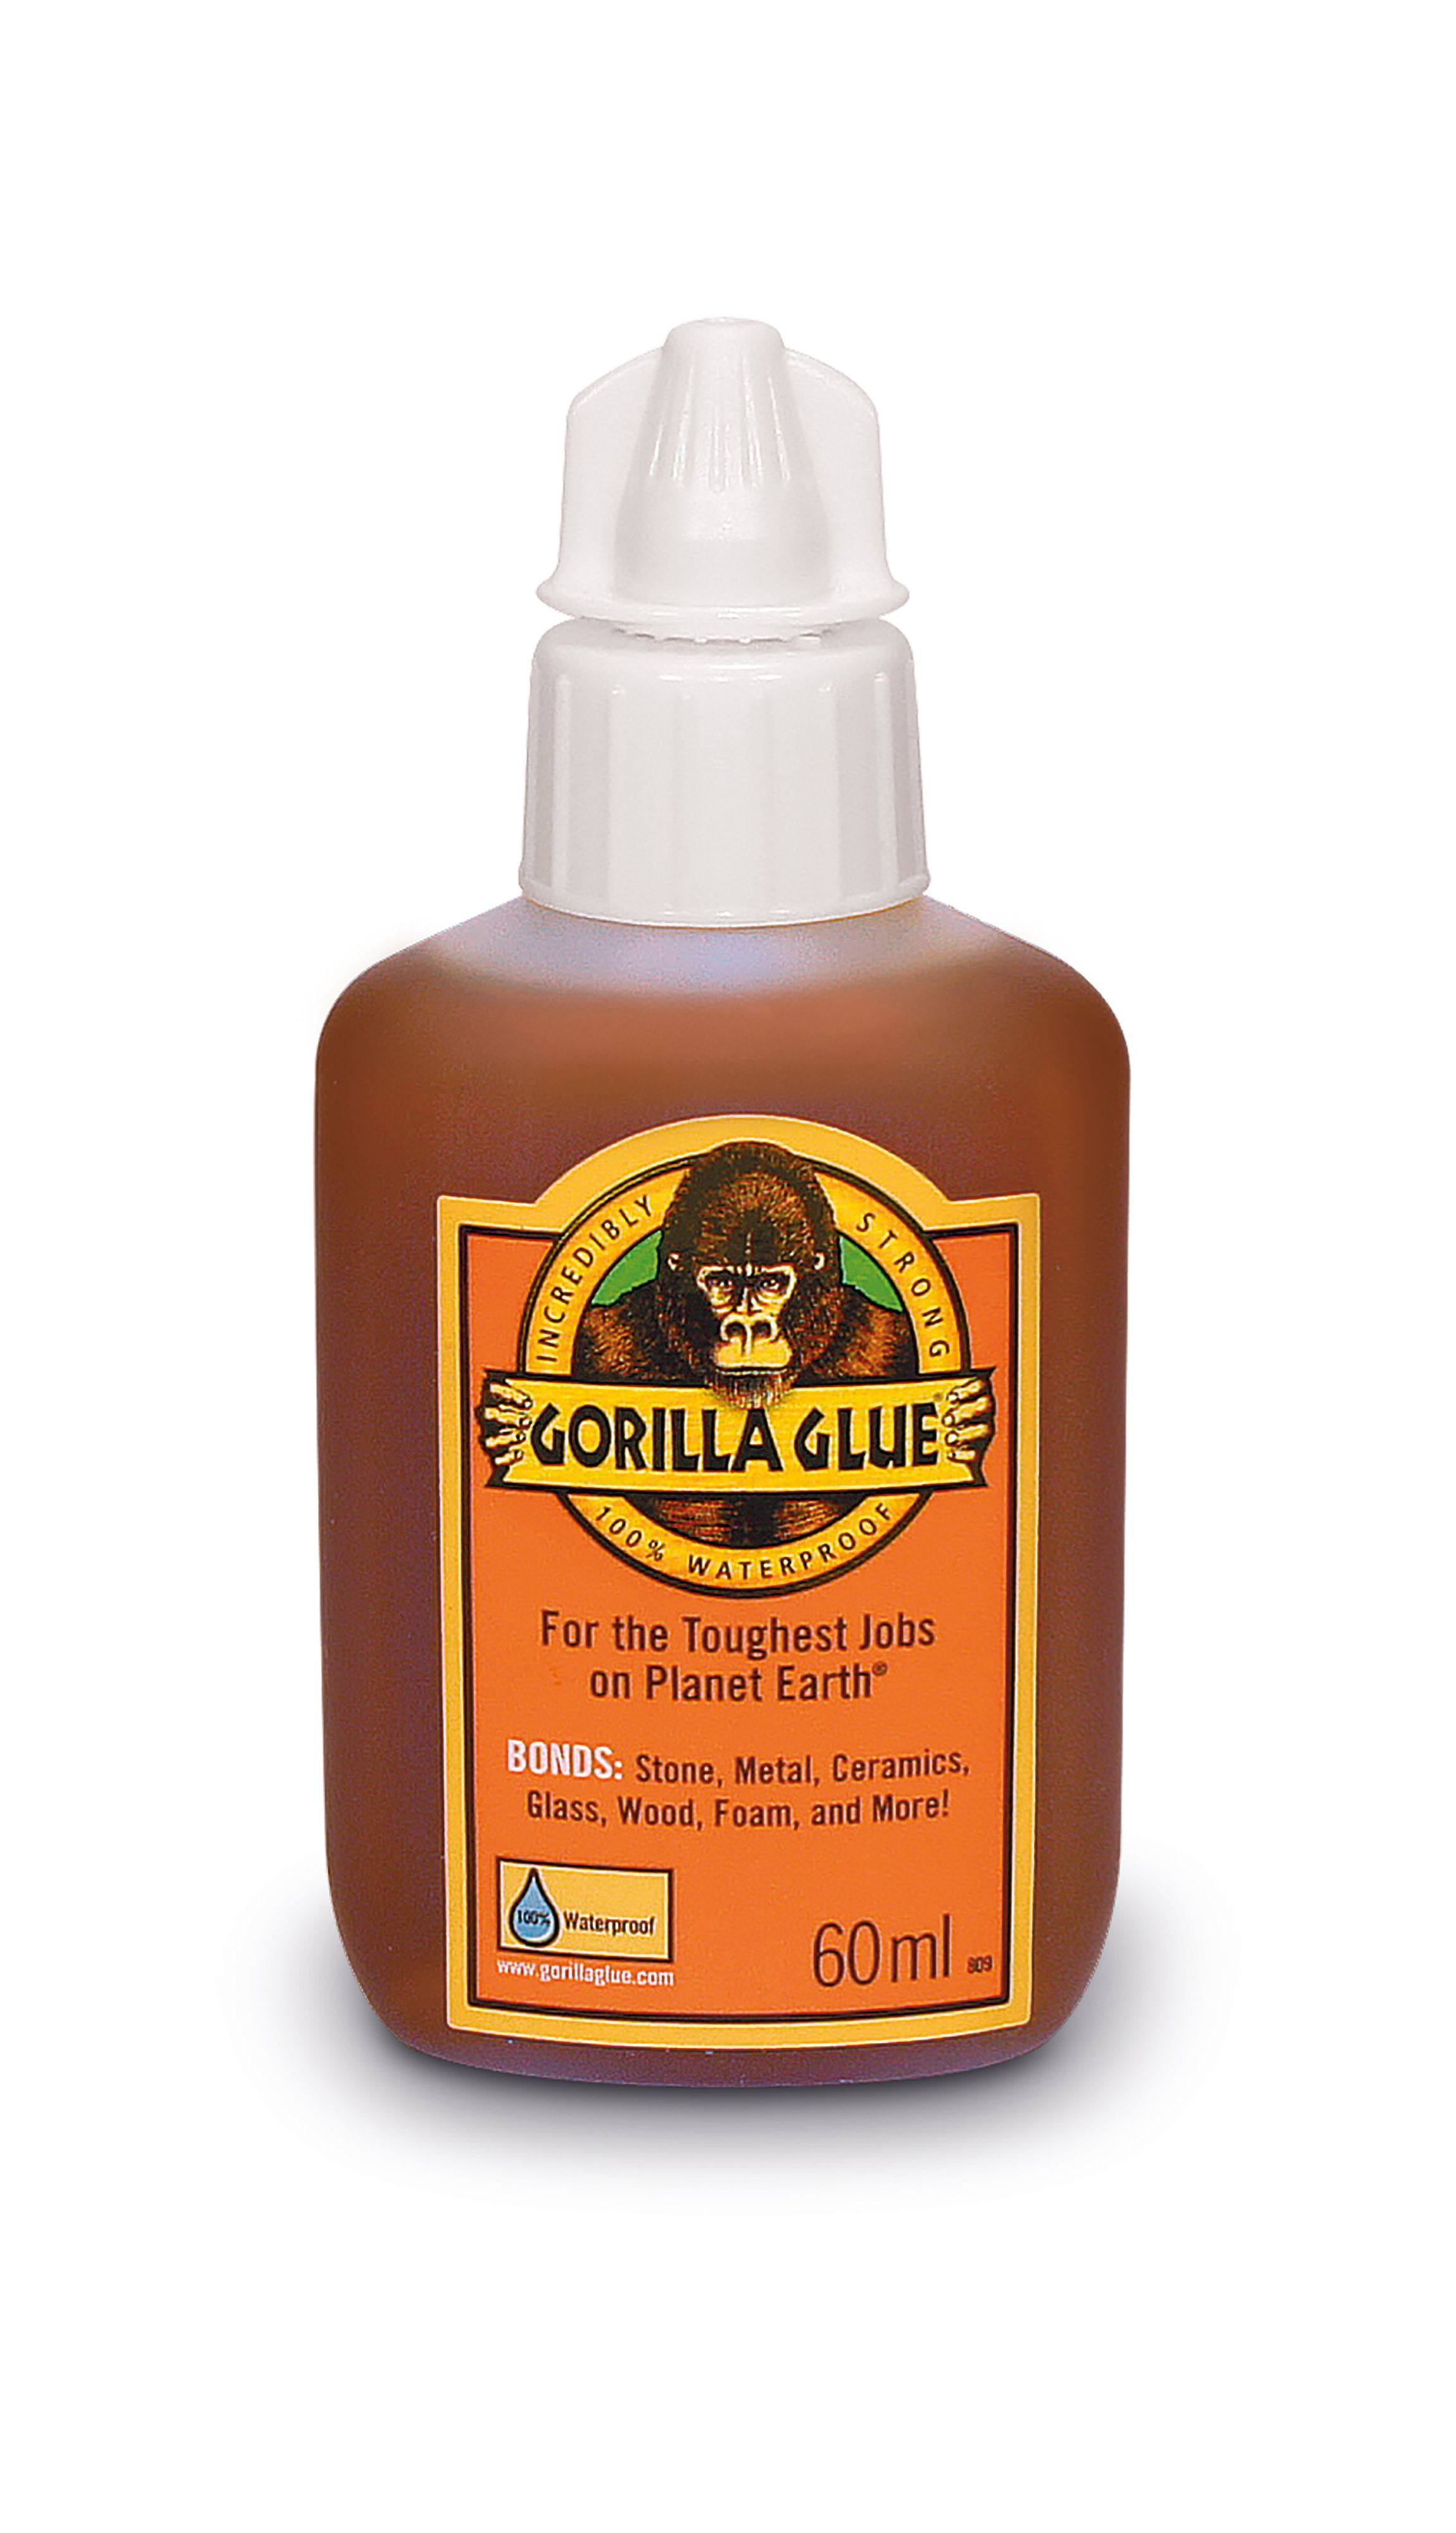 Gorilla Glue Review >> Gorilla Glue 60ml Departments Diy At B Q